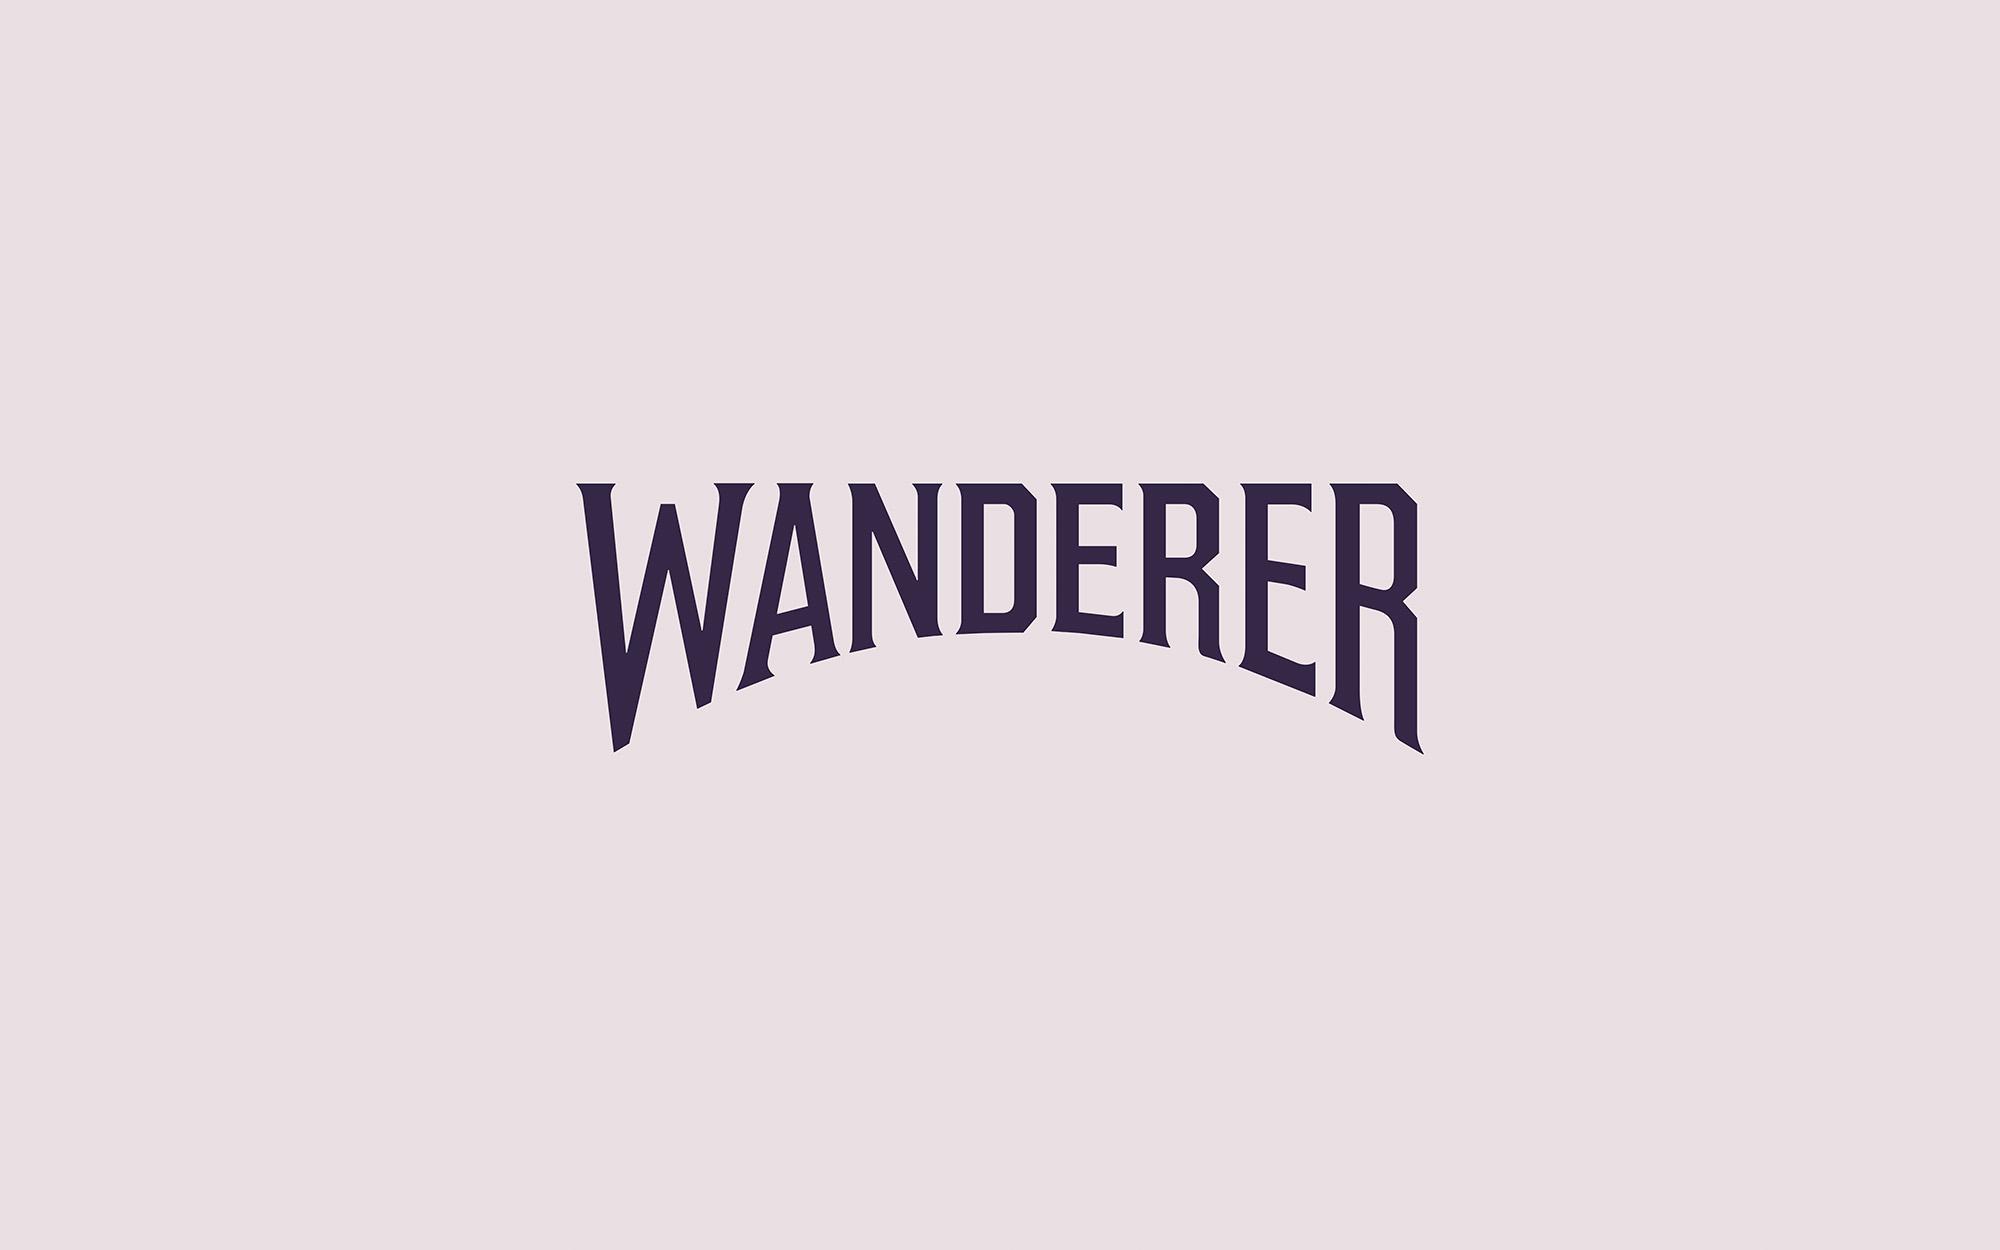 WandererLogo.jpg